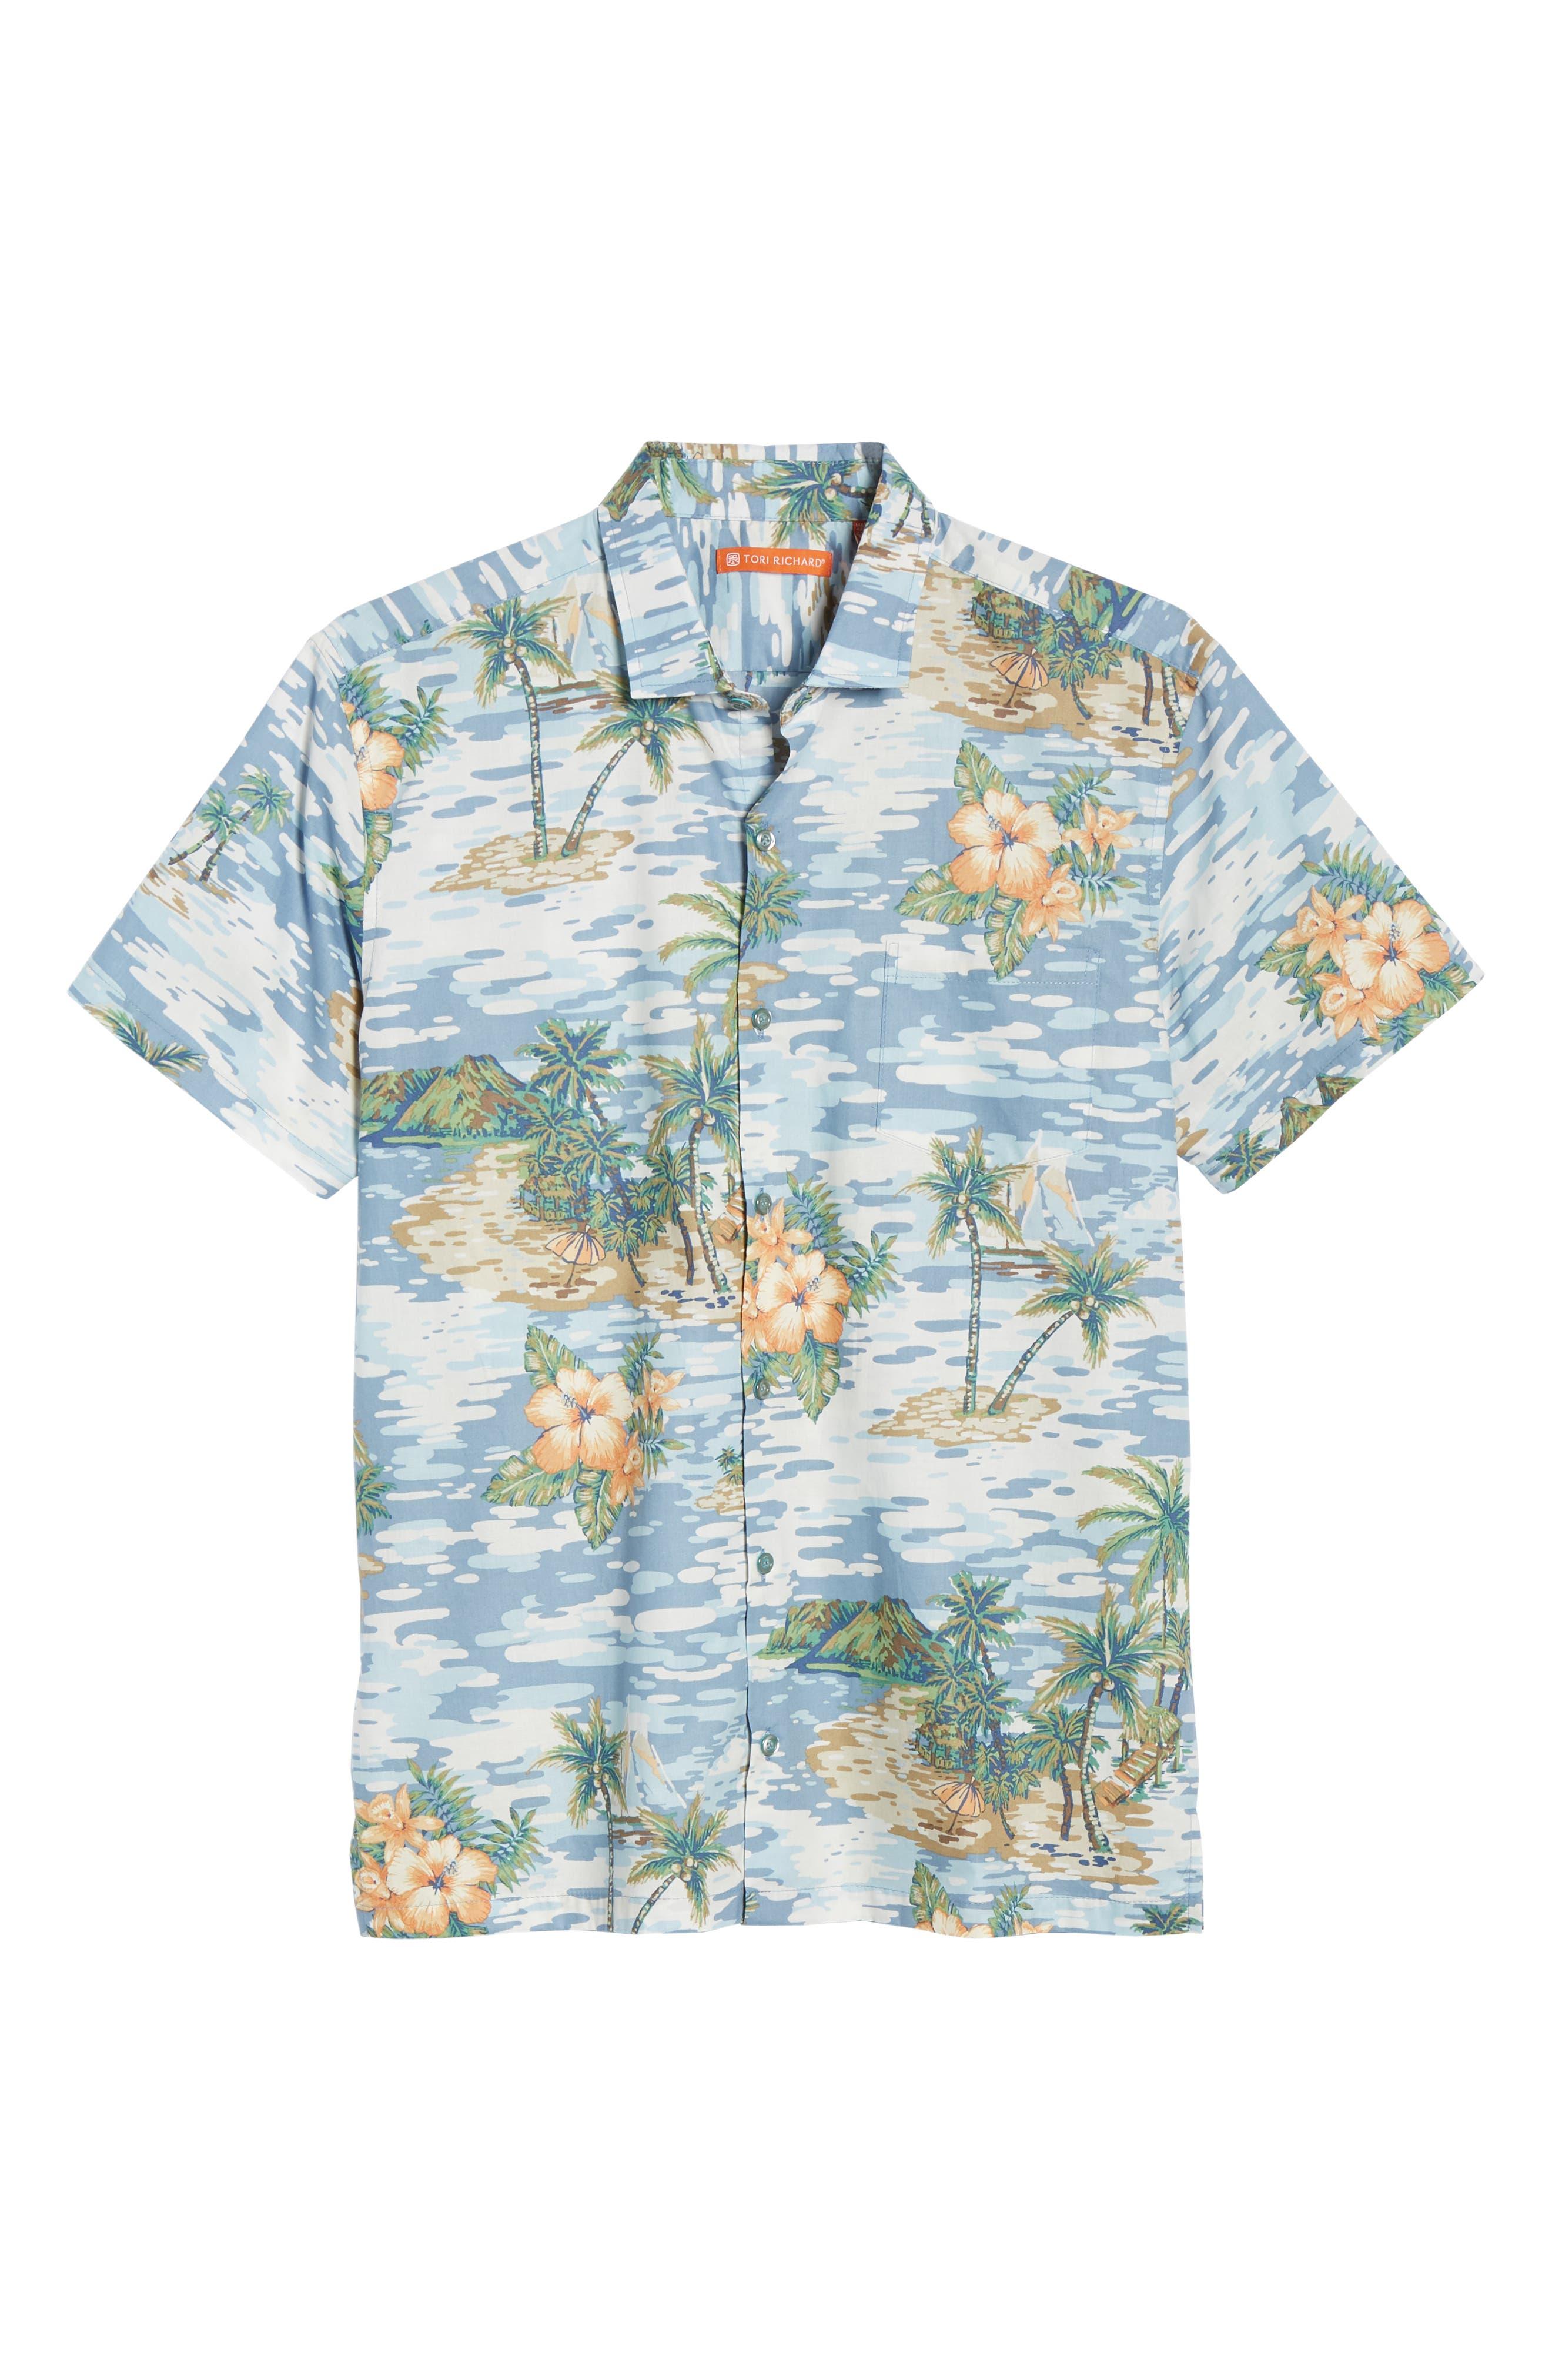 TORI RICHARD, Archipelago Regular Fit Sport Shirt, Alternate thumbnail 5, color, 061